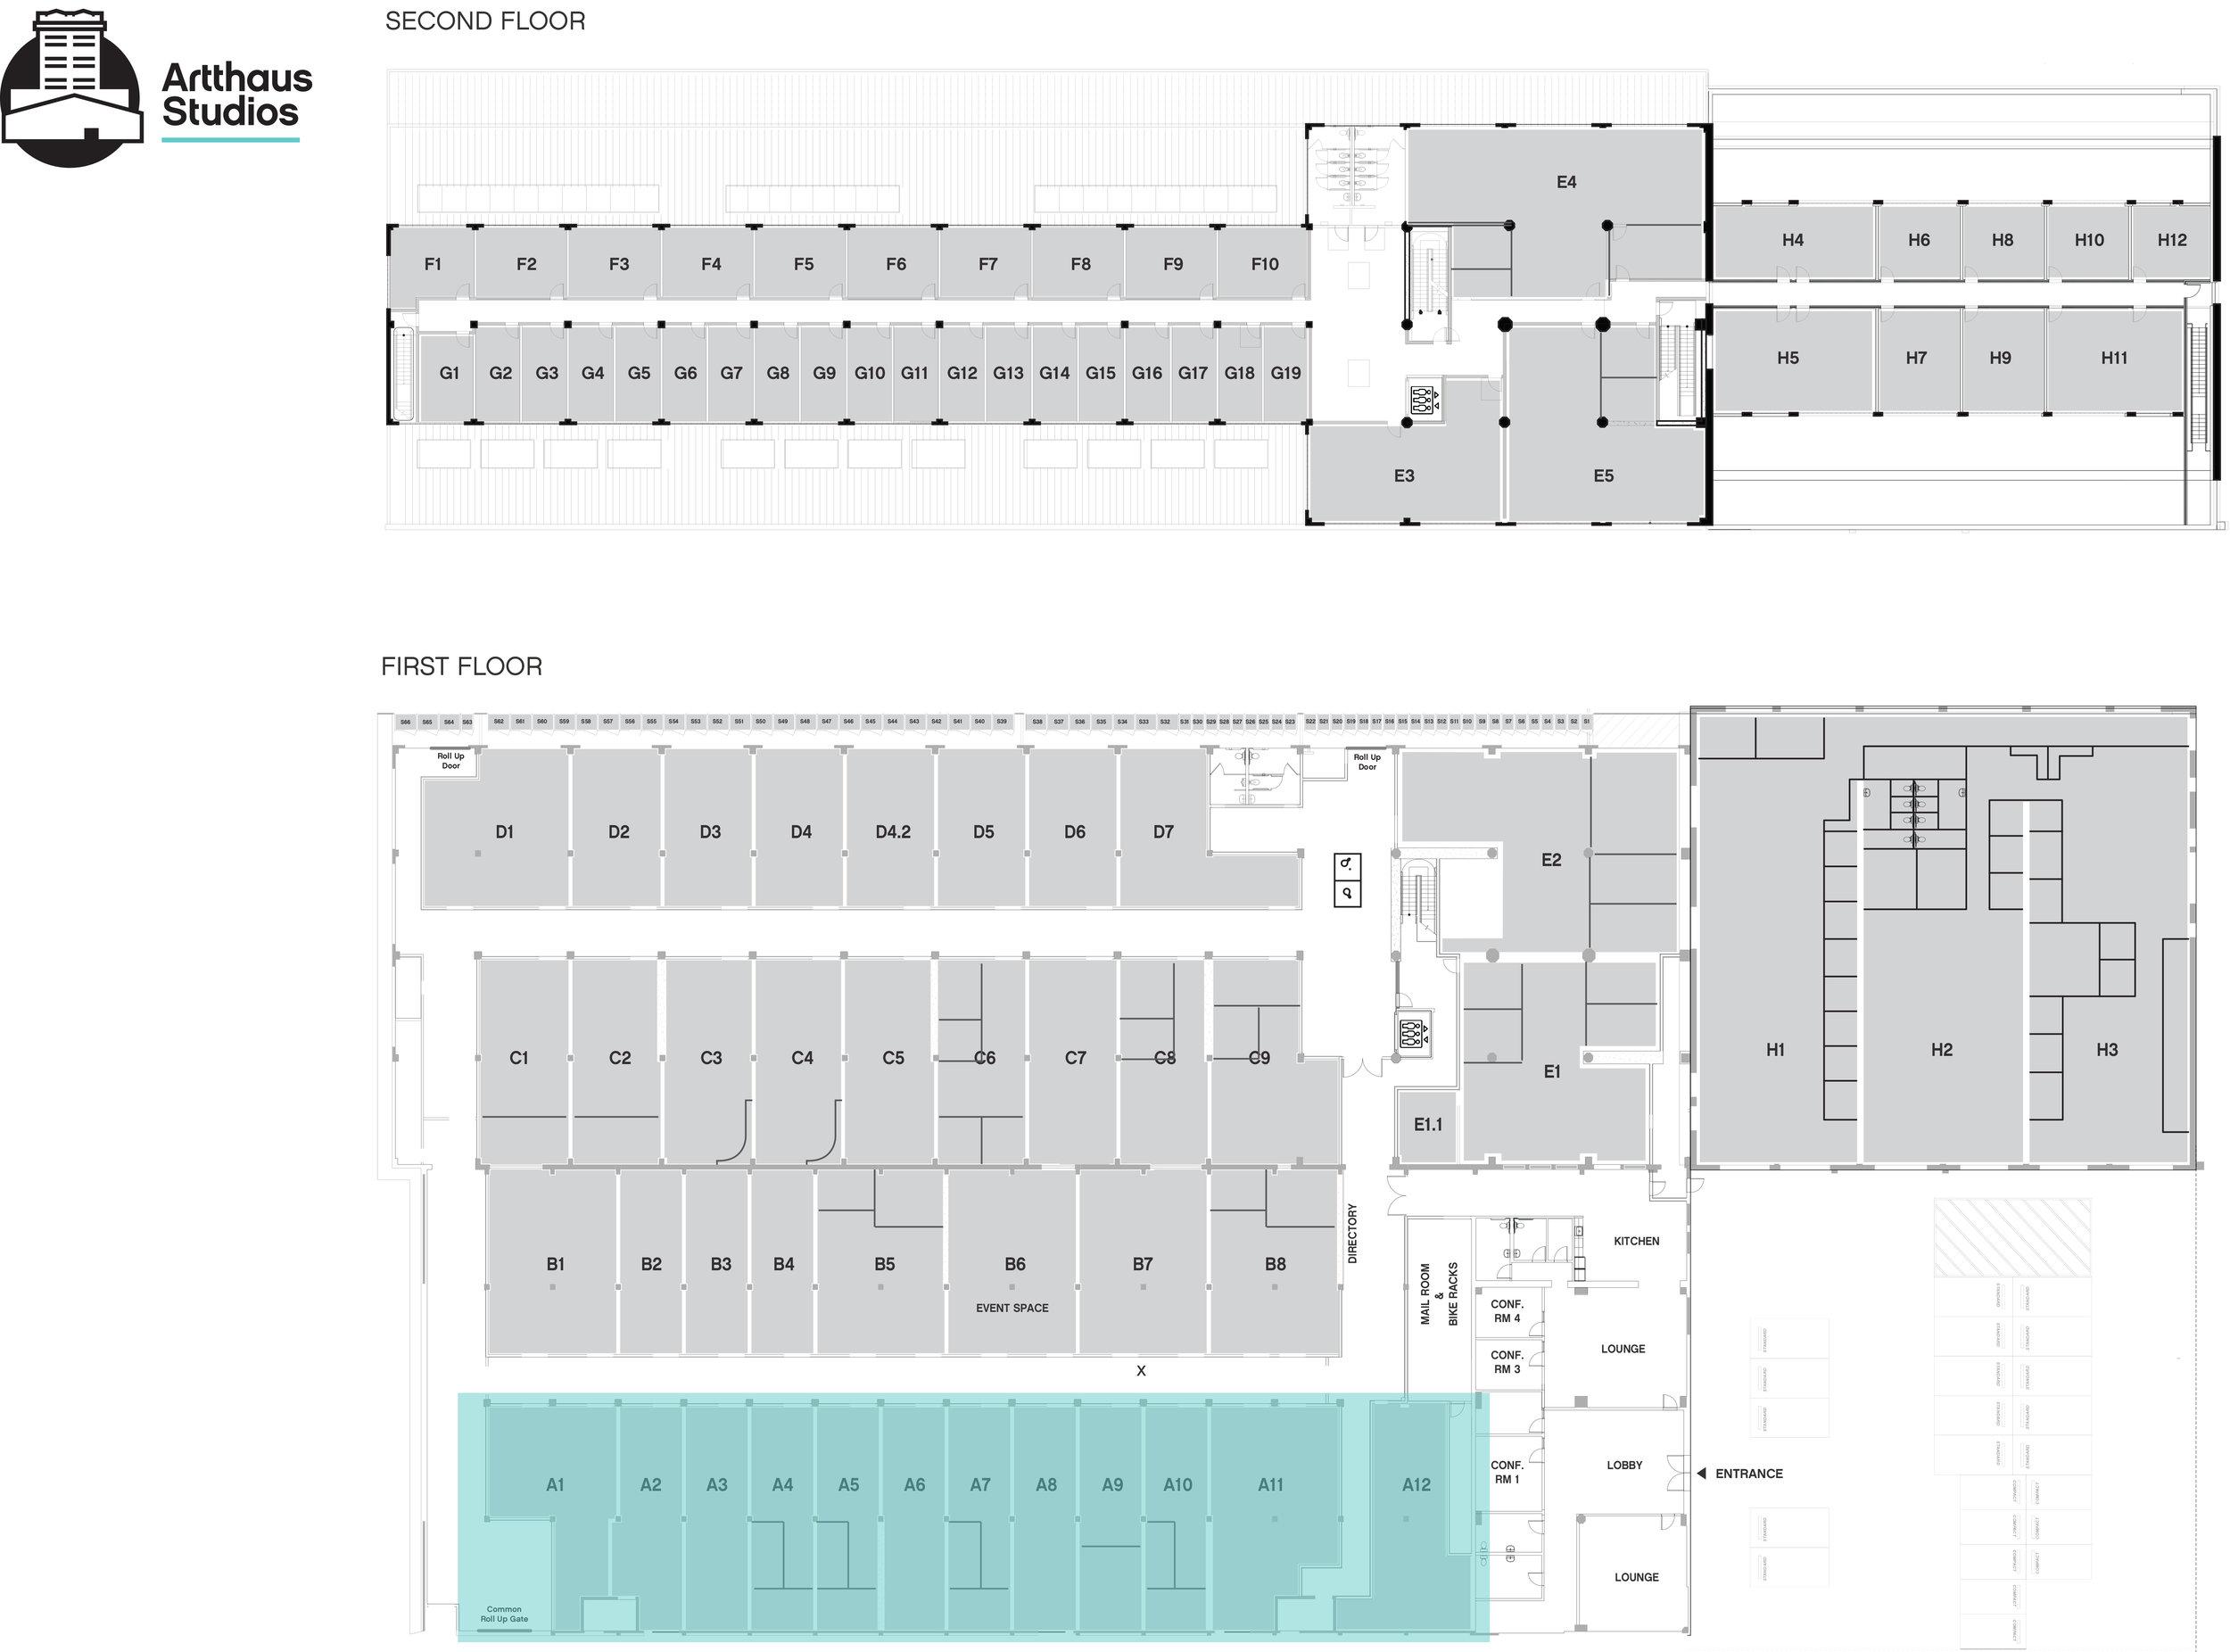 Artthaus Studios_Map_Aspaces.jpg